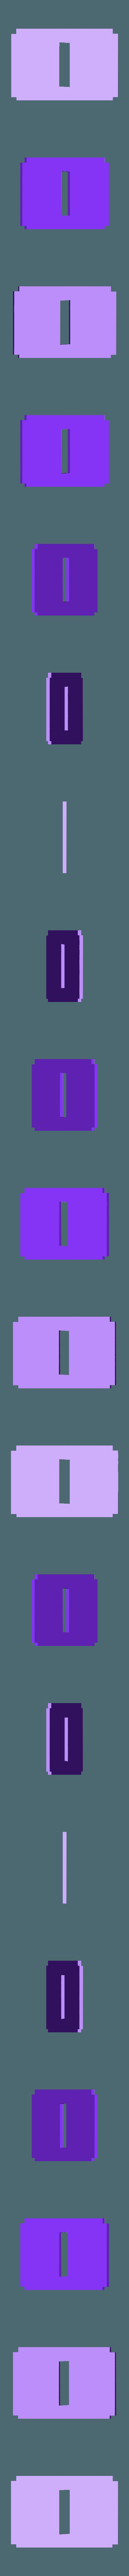 WATERTANK_8.stl Download free STL file FISH TANK FUNKO POP OR PEGGYBANK • 3D printer template, gaaraa